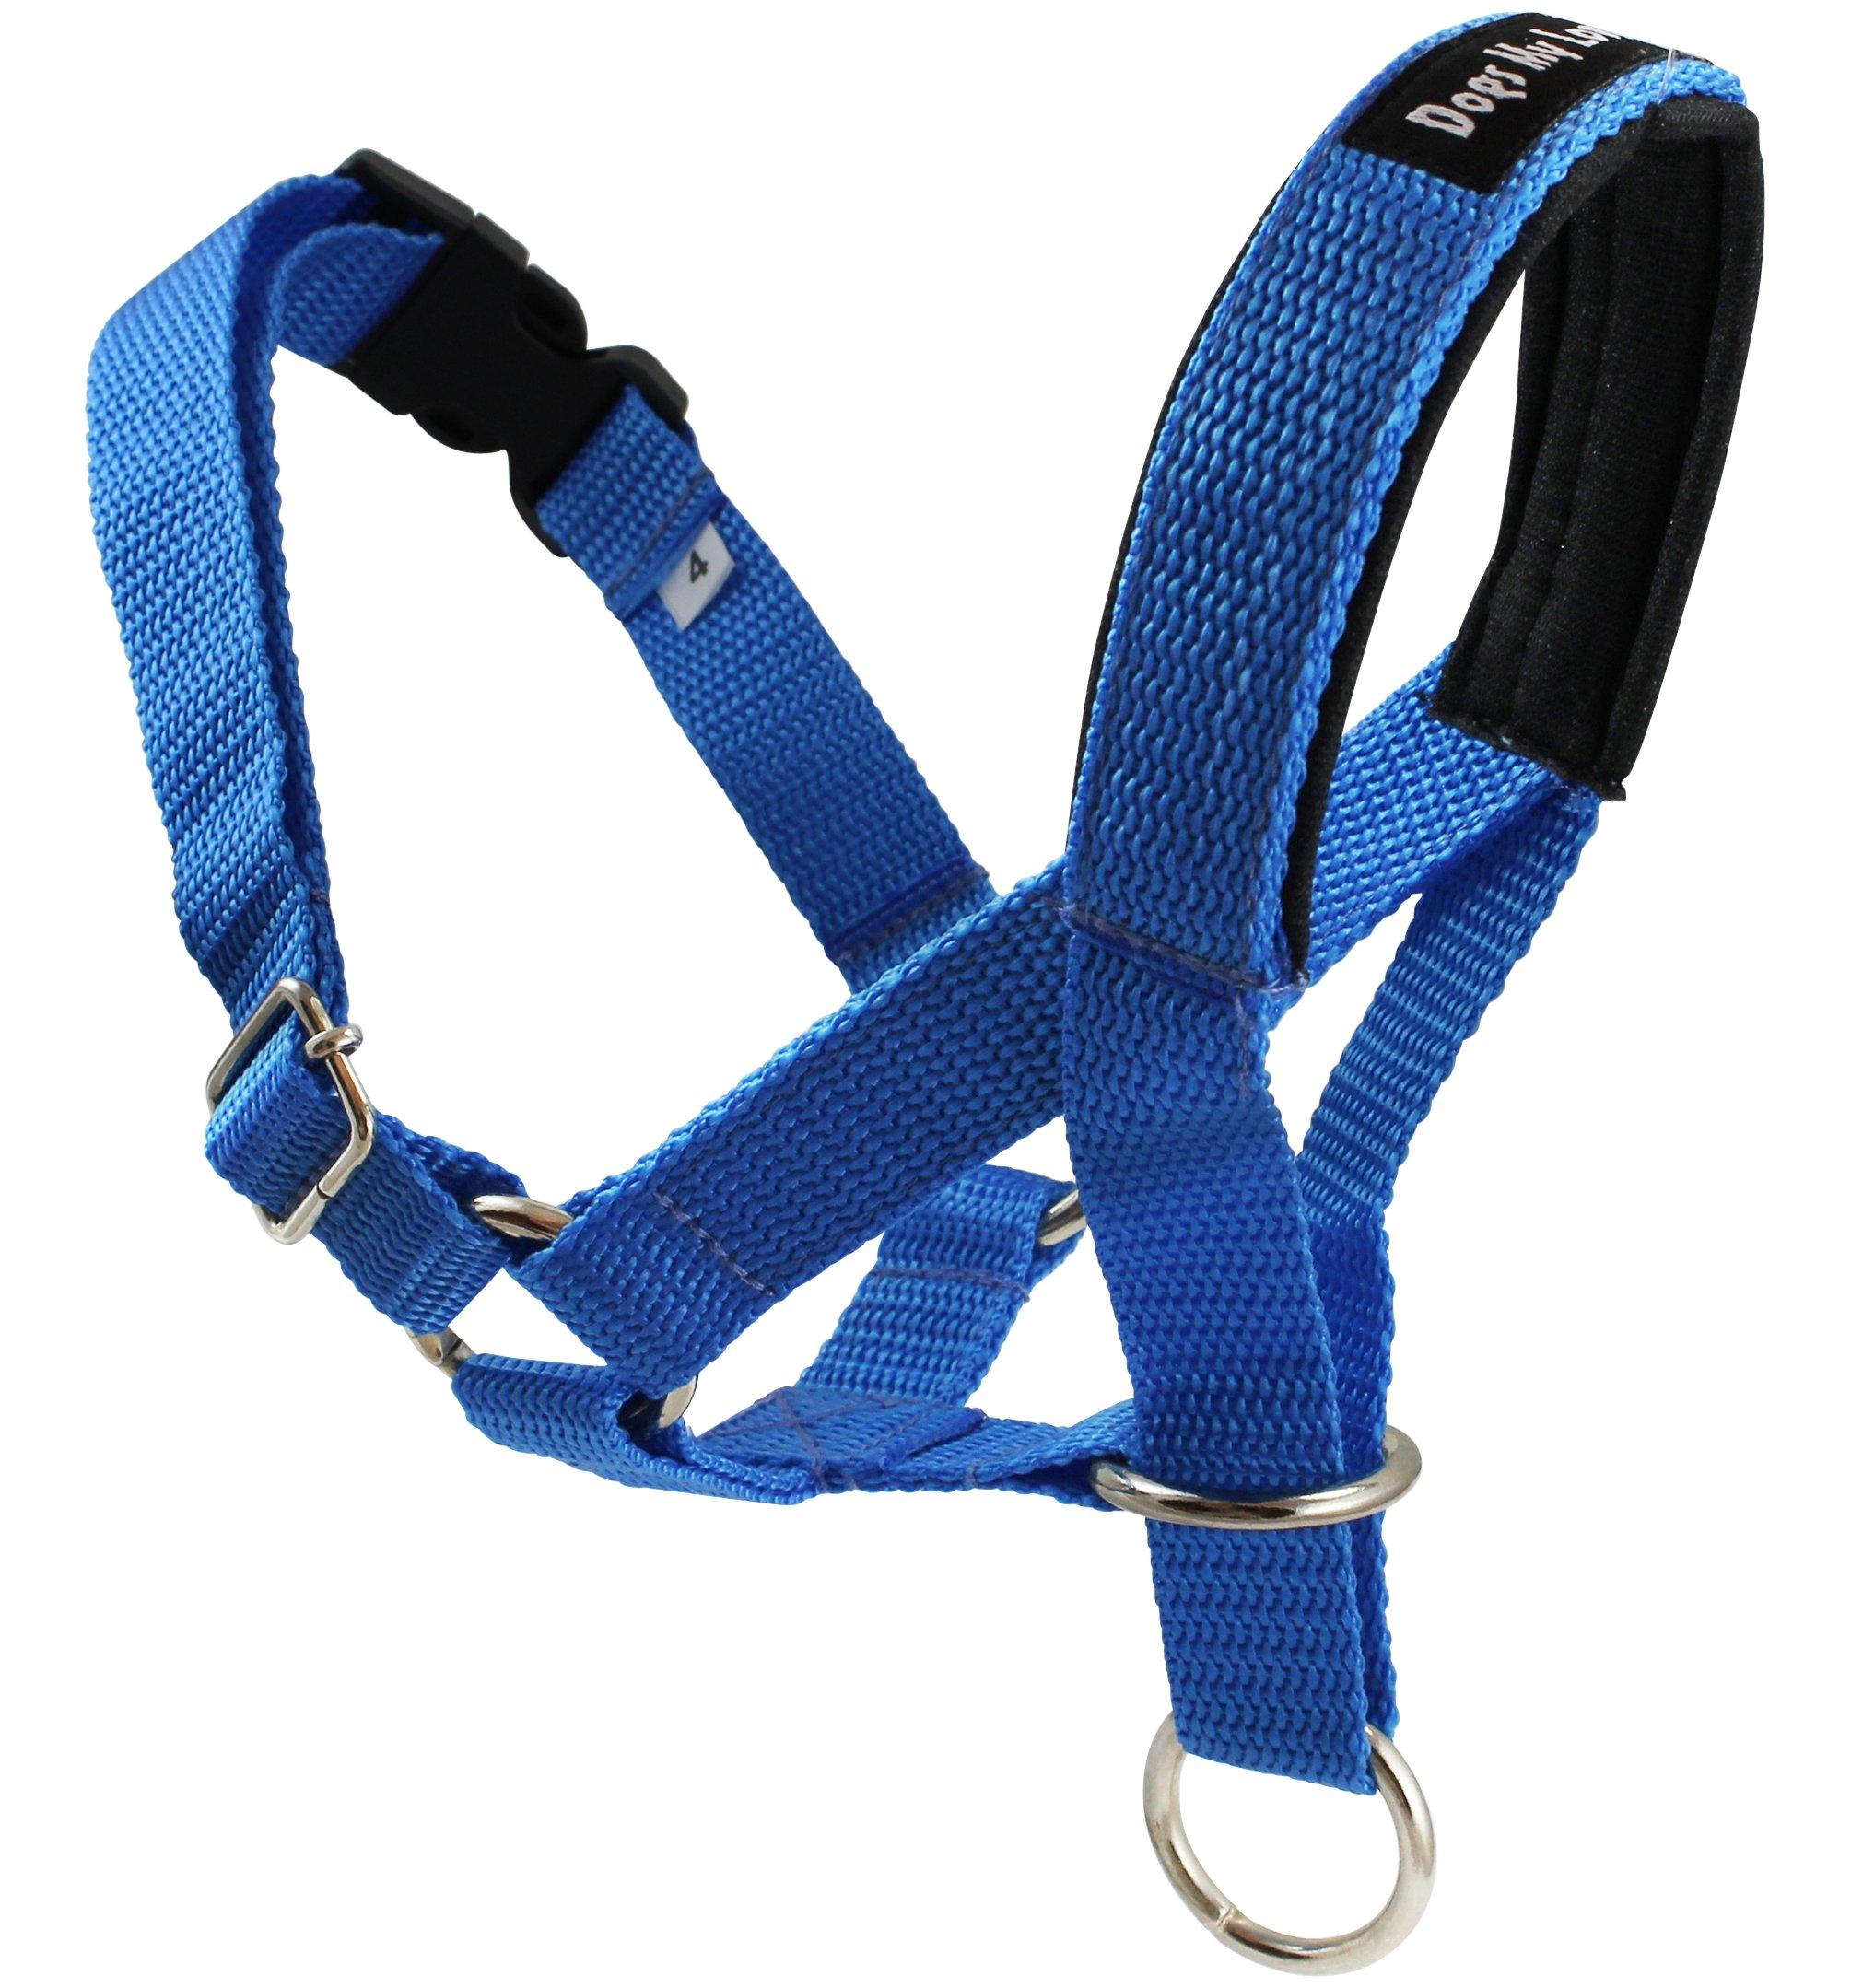 Dog Head Collar Halter Blue 5 Sizes (M: 8.25''-10.25'' Snout)